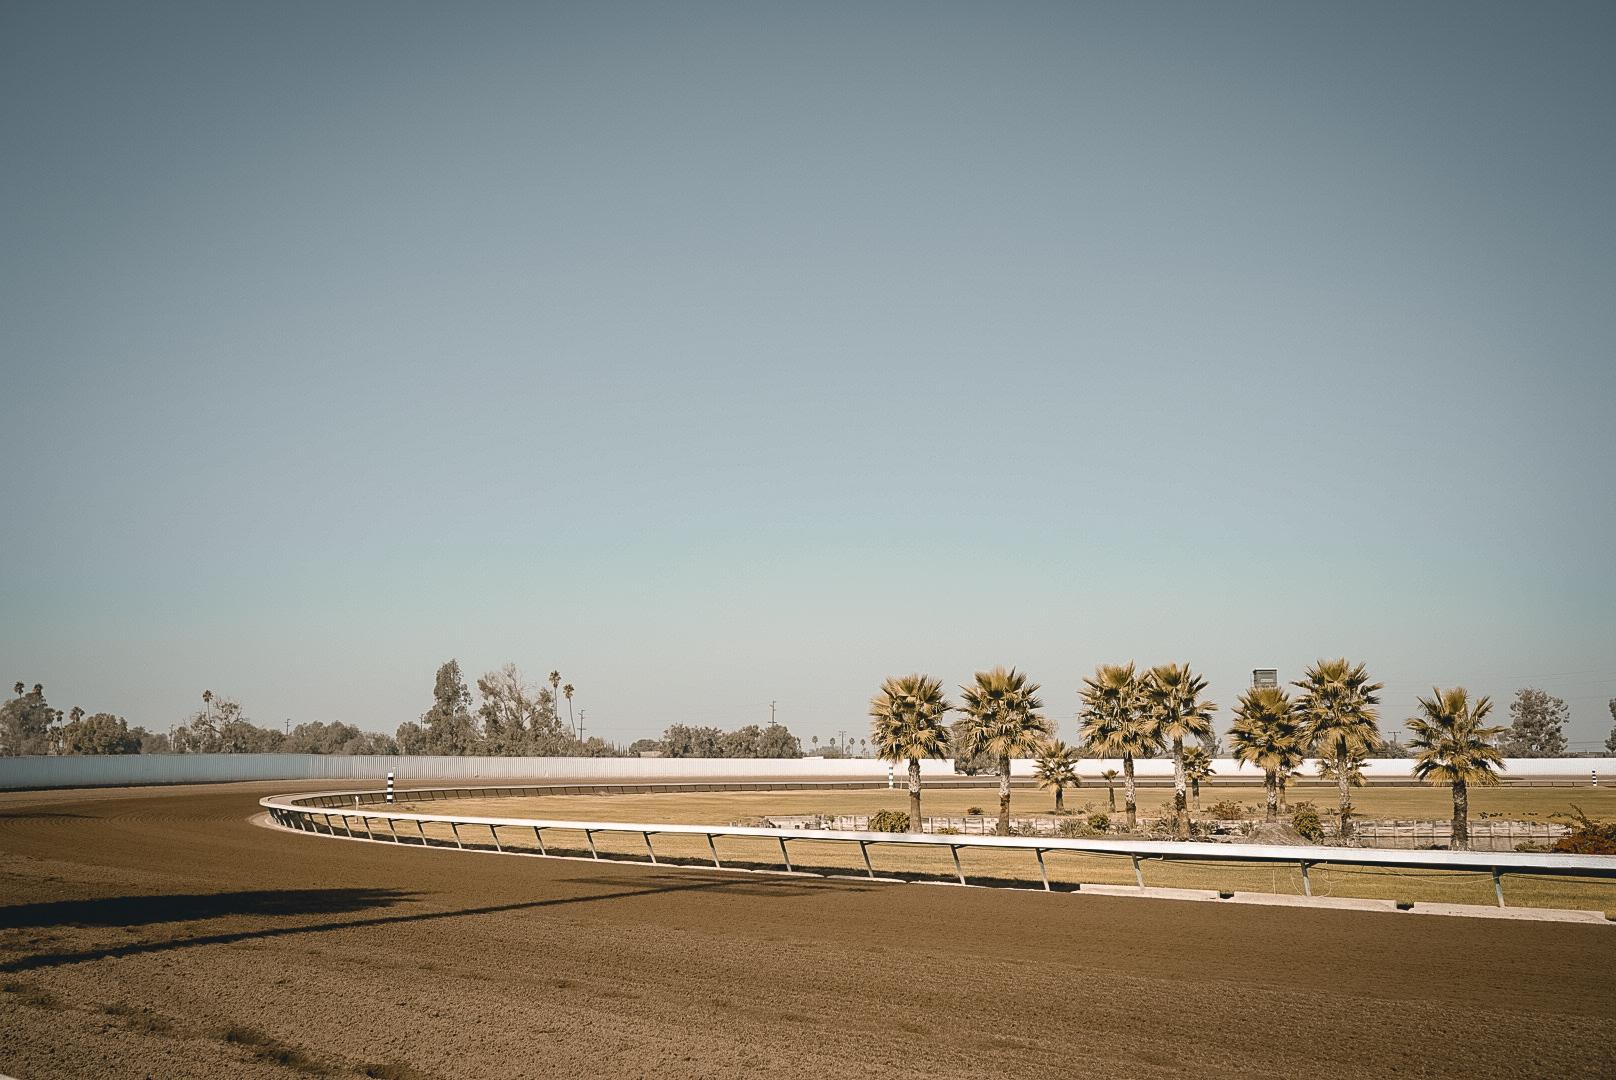 © 2018 Jared Kessler, Los Alamitos Racetrack.